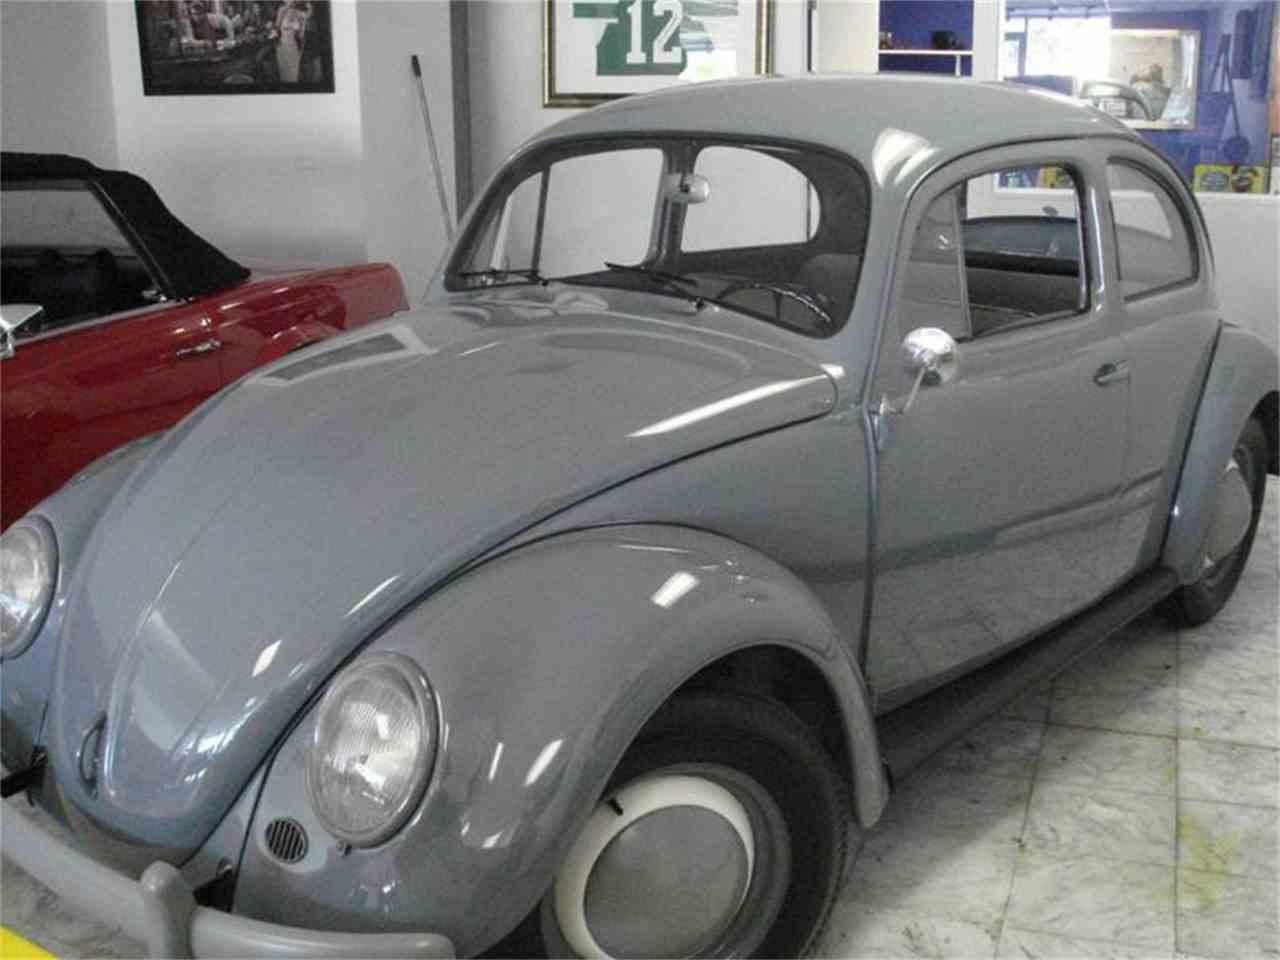 Volkswagen Beetle For Sale ClassicCarscom CC - Pompano classic cars